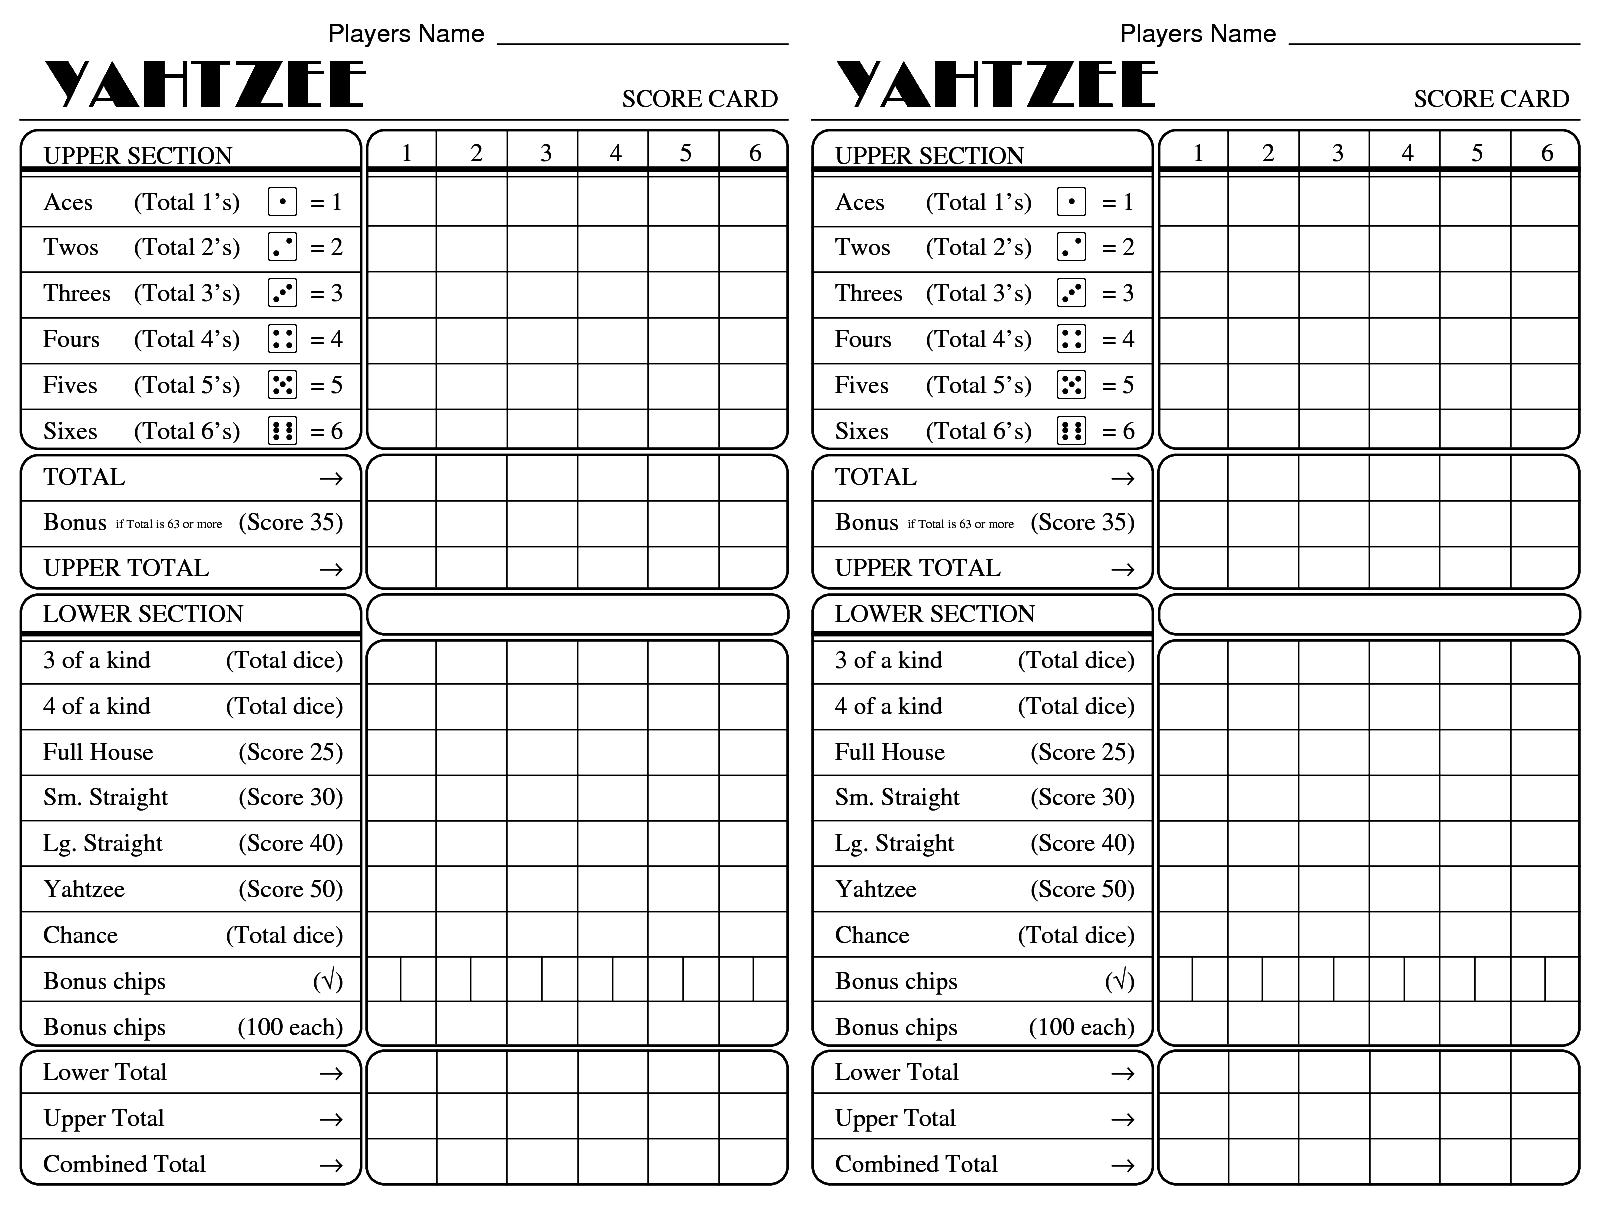 Printable yahtzee score card